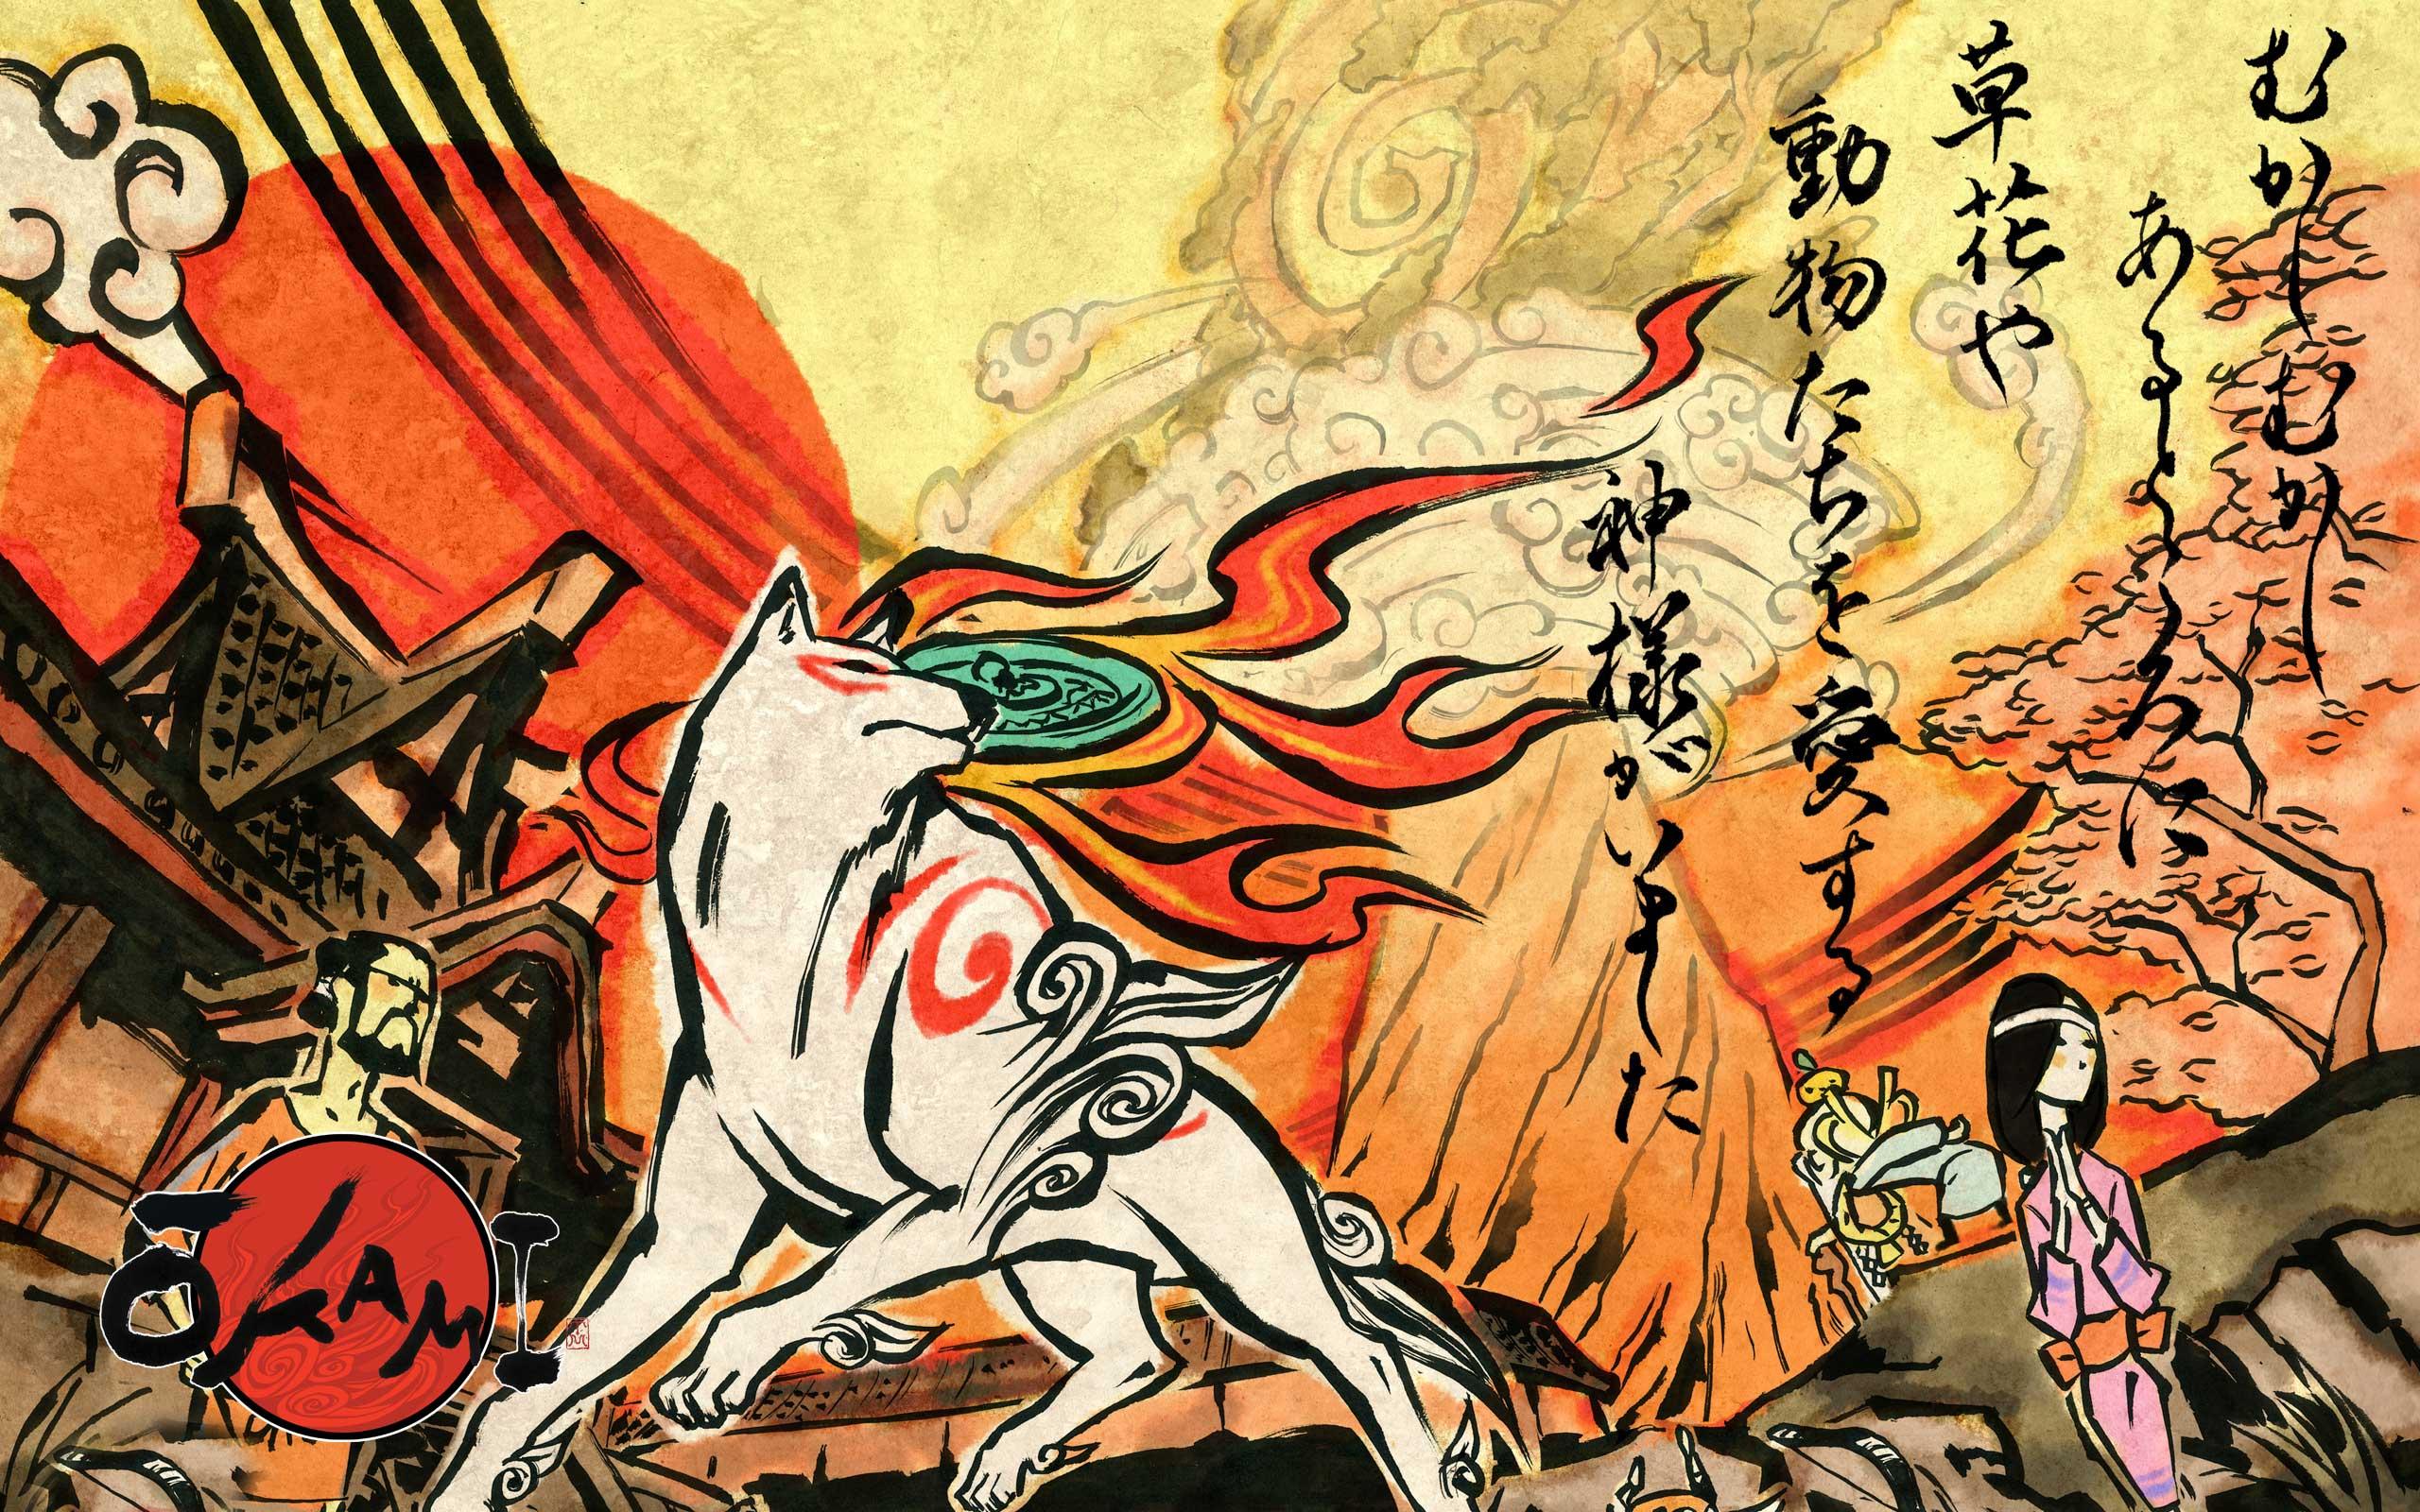 Return to Okami